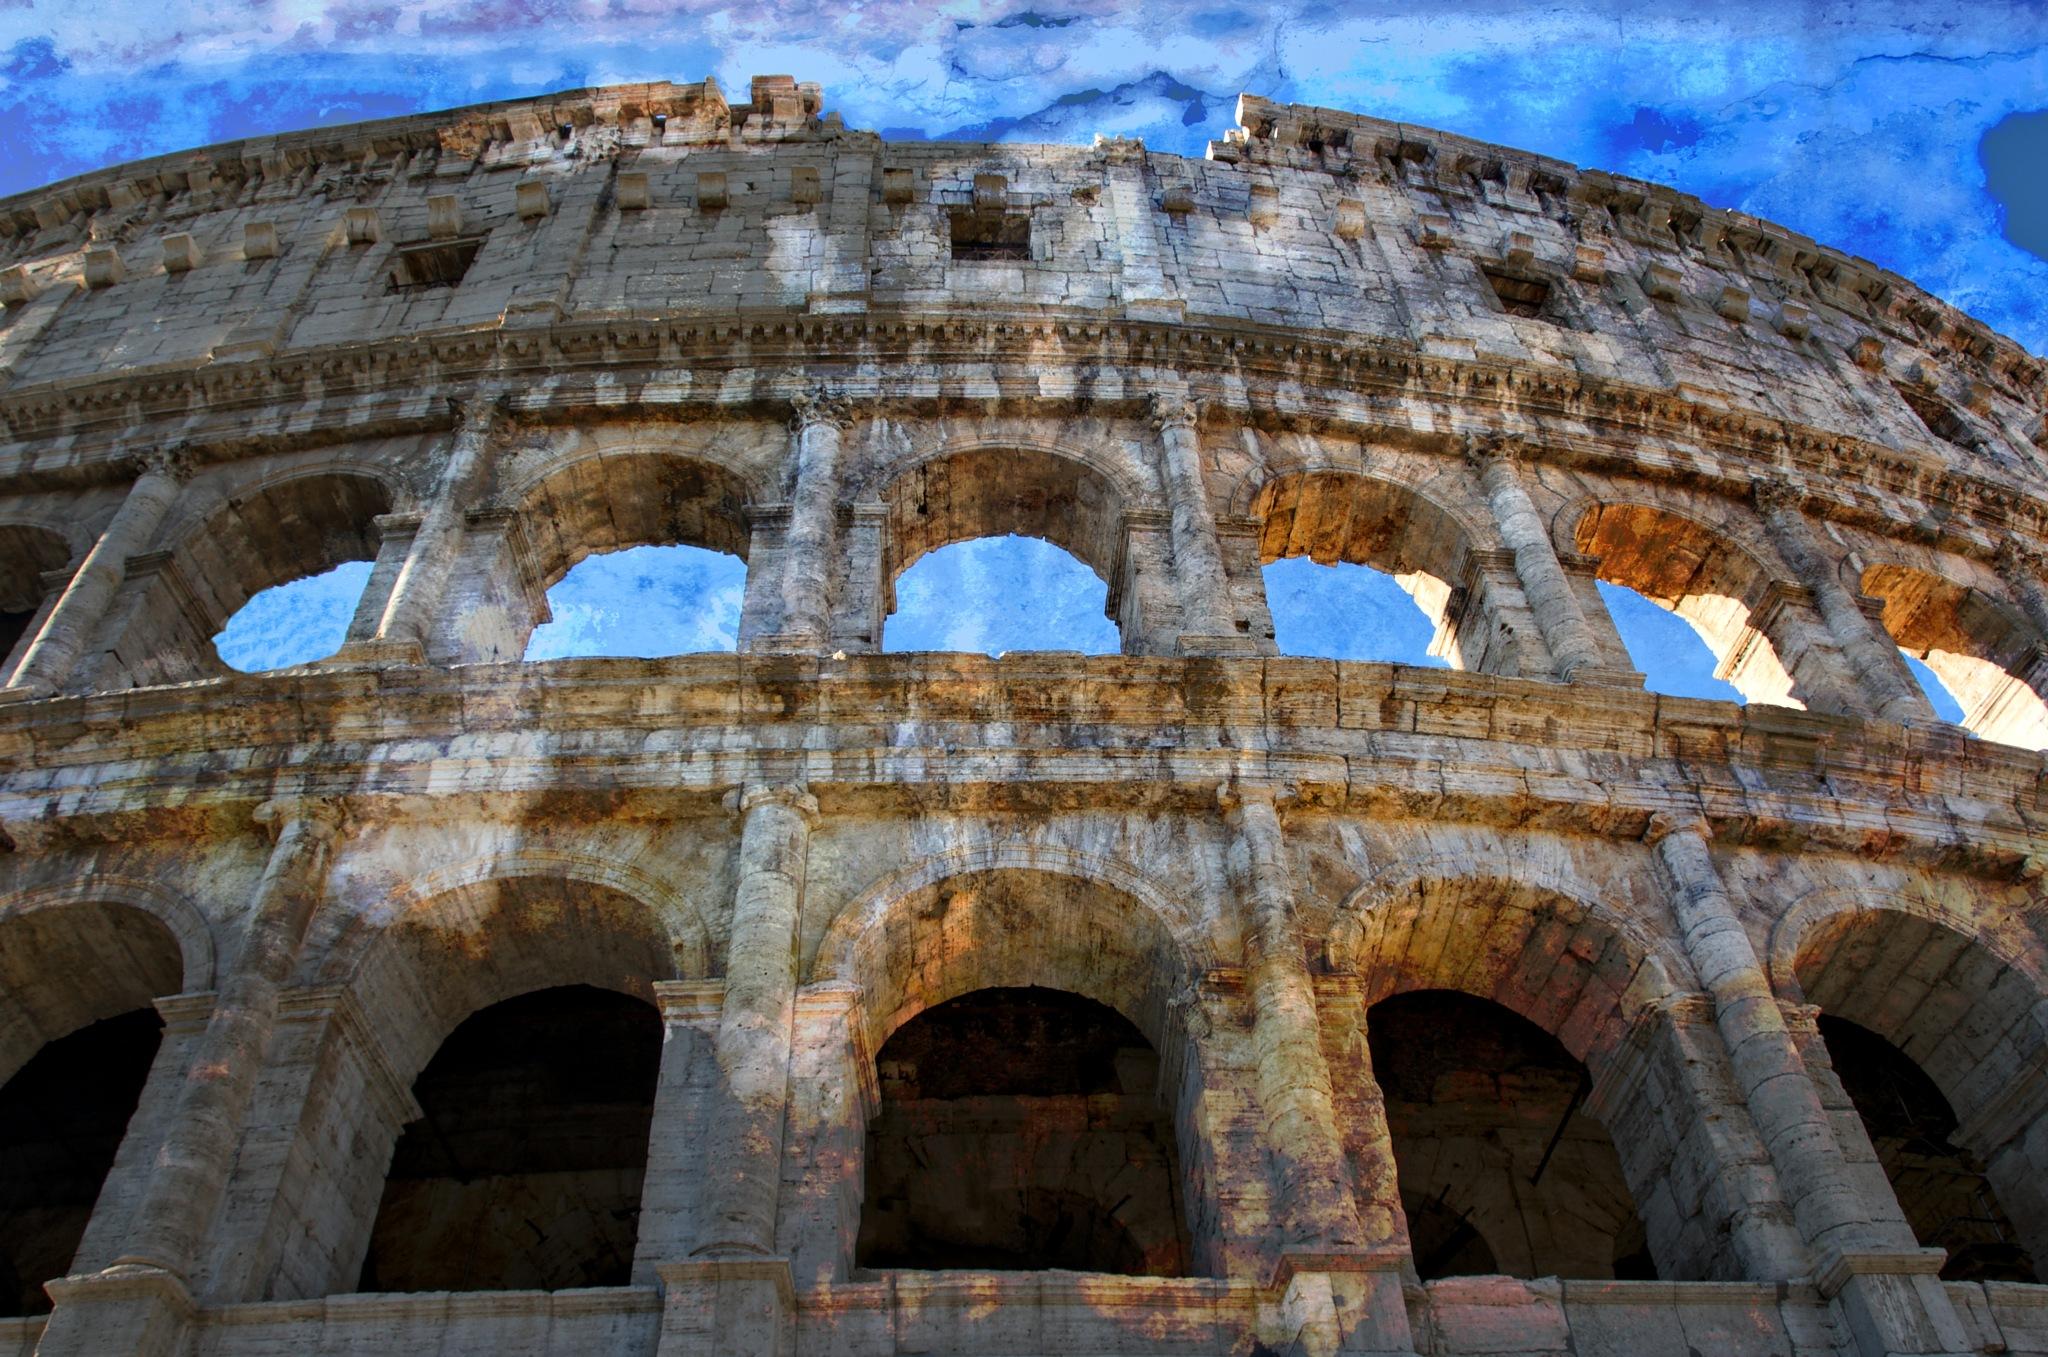 Colosseum by Piet de Rijcke